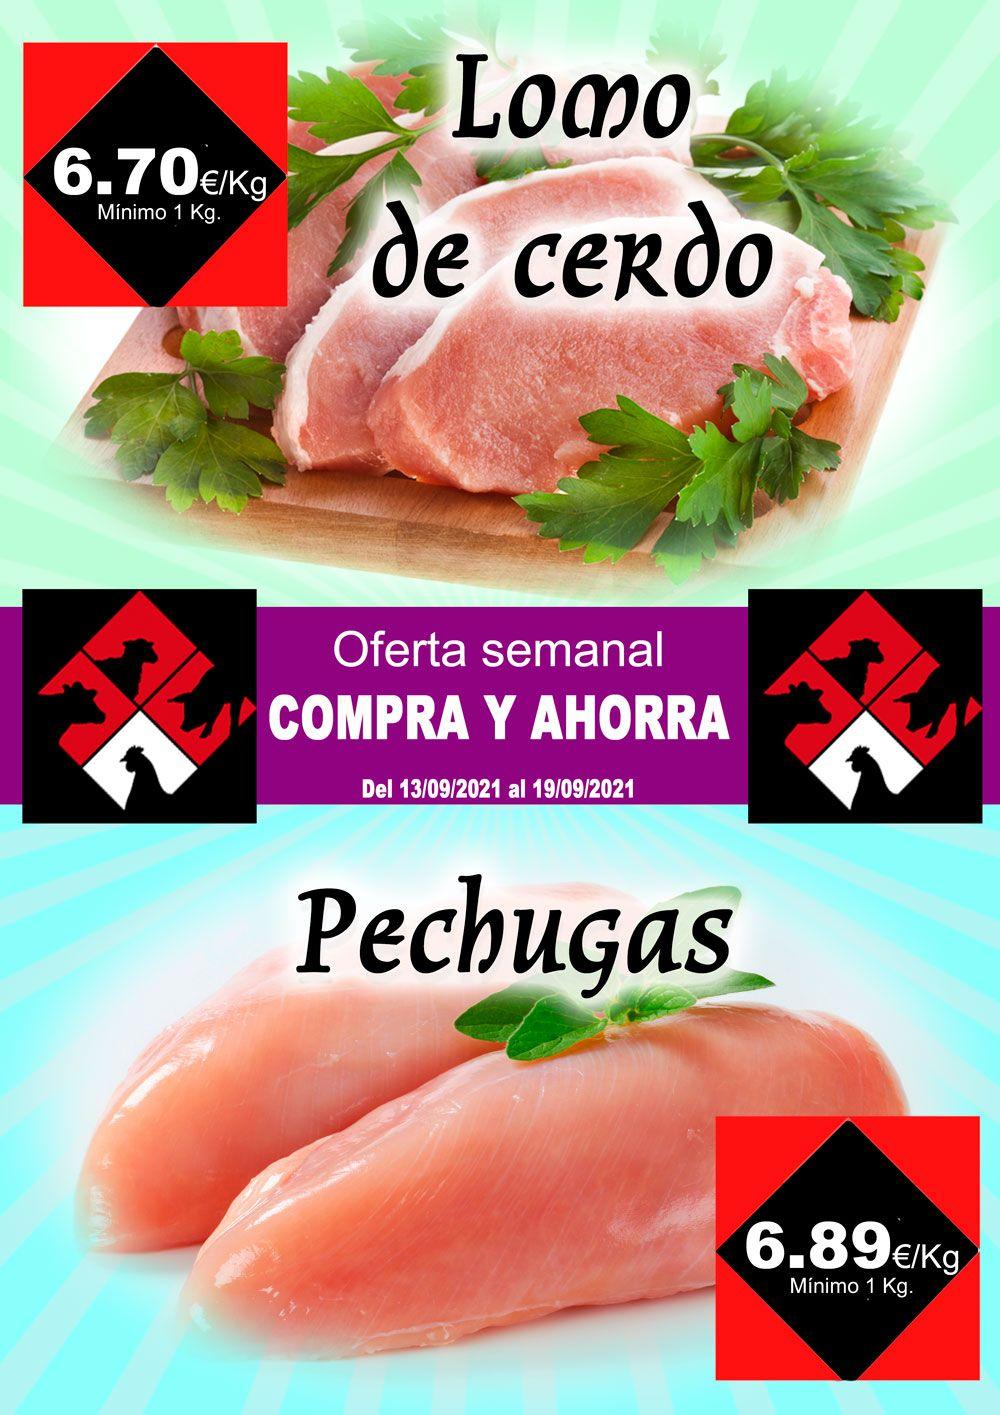 Carniceria Hermanos Casabona Oferta Lomo de cerdo y Pechugas semana 37.2021